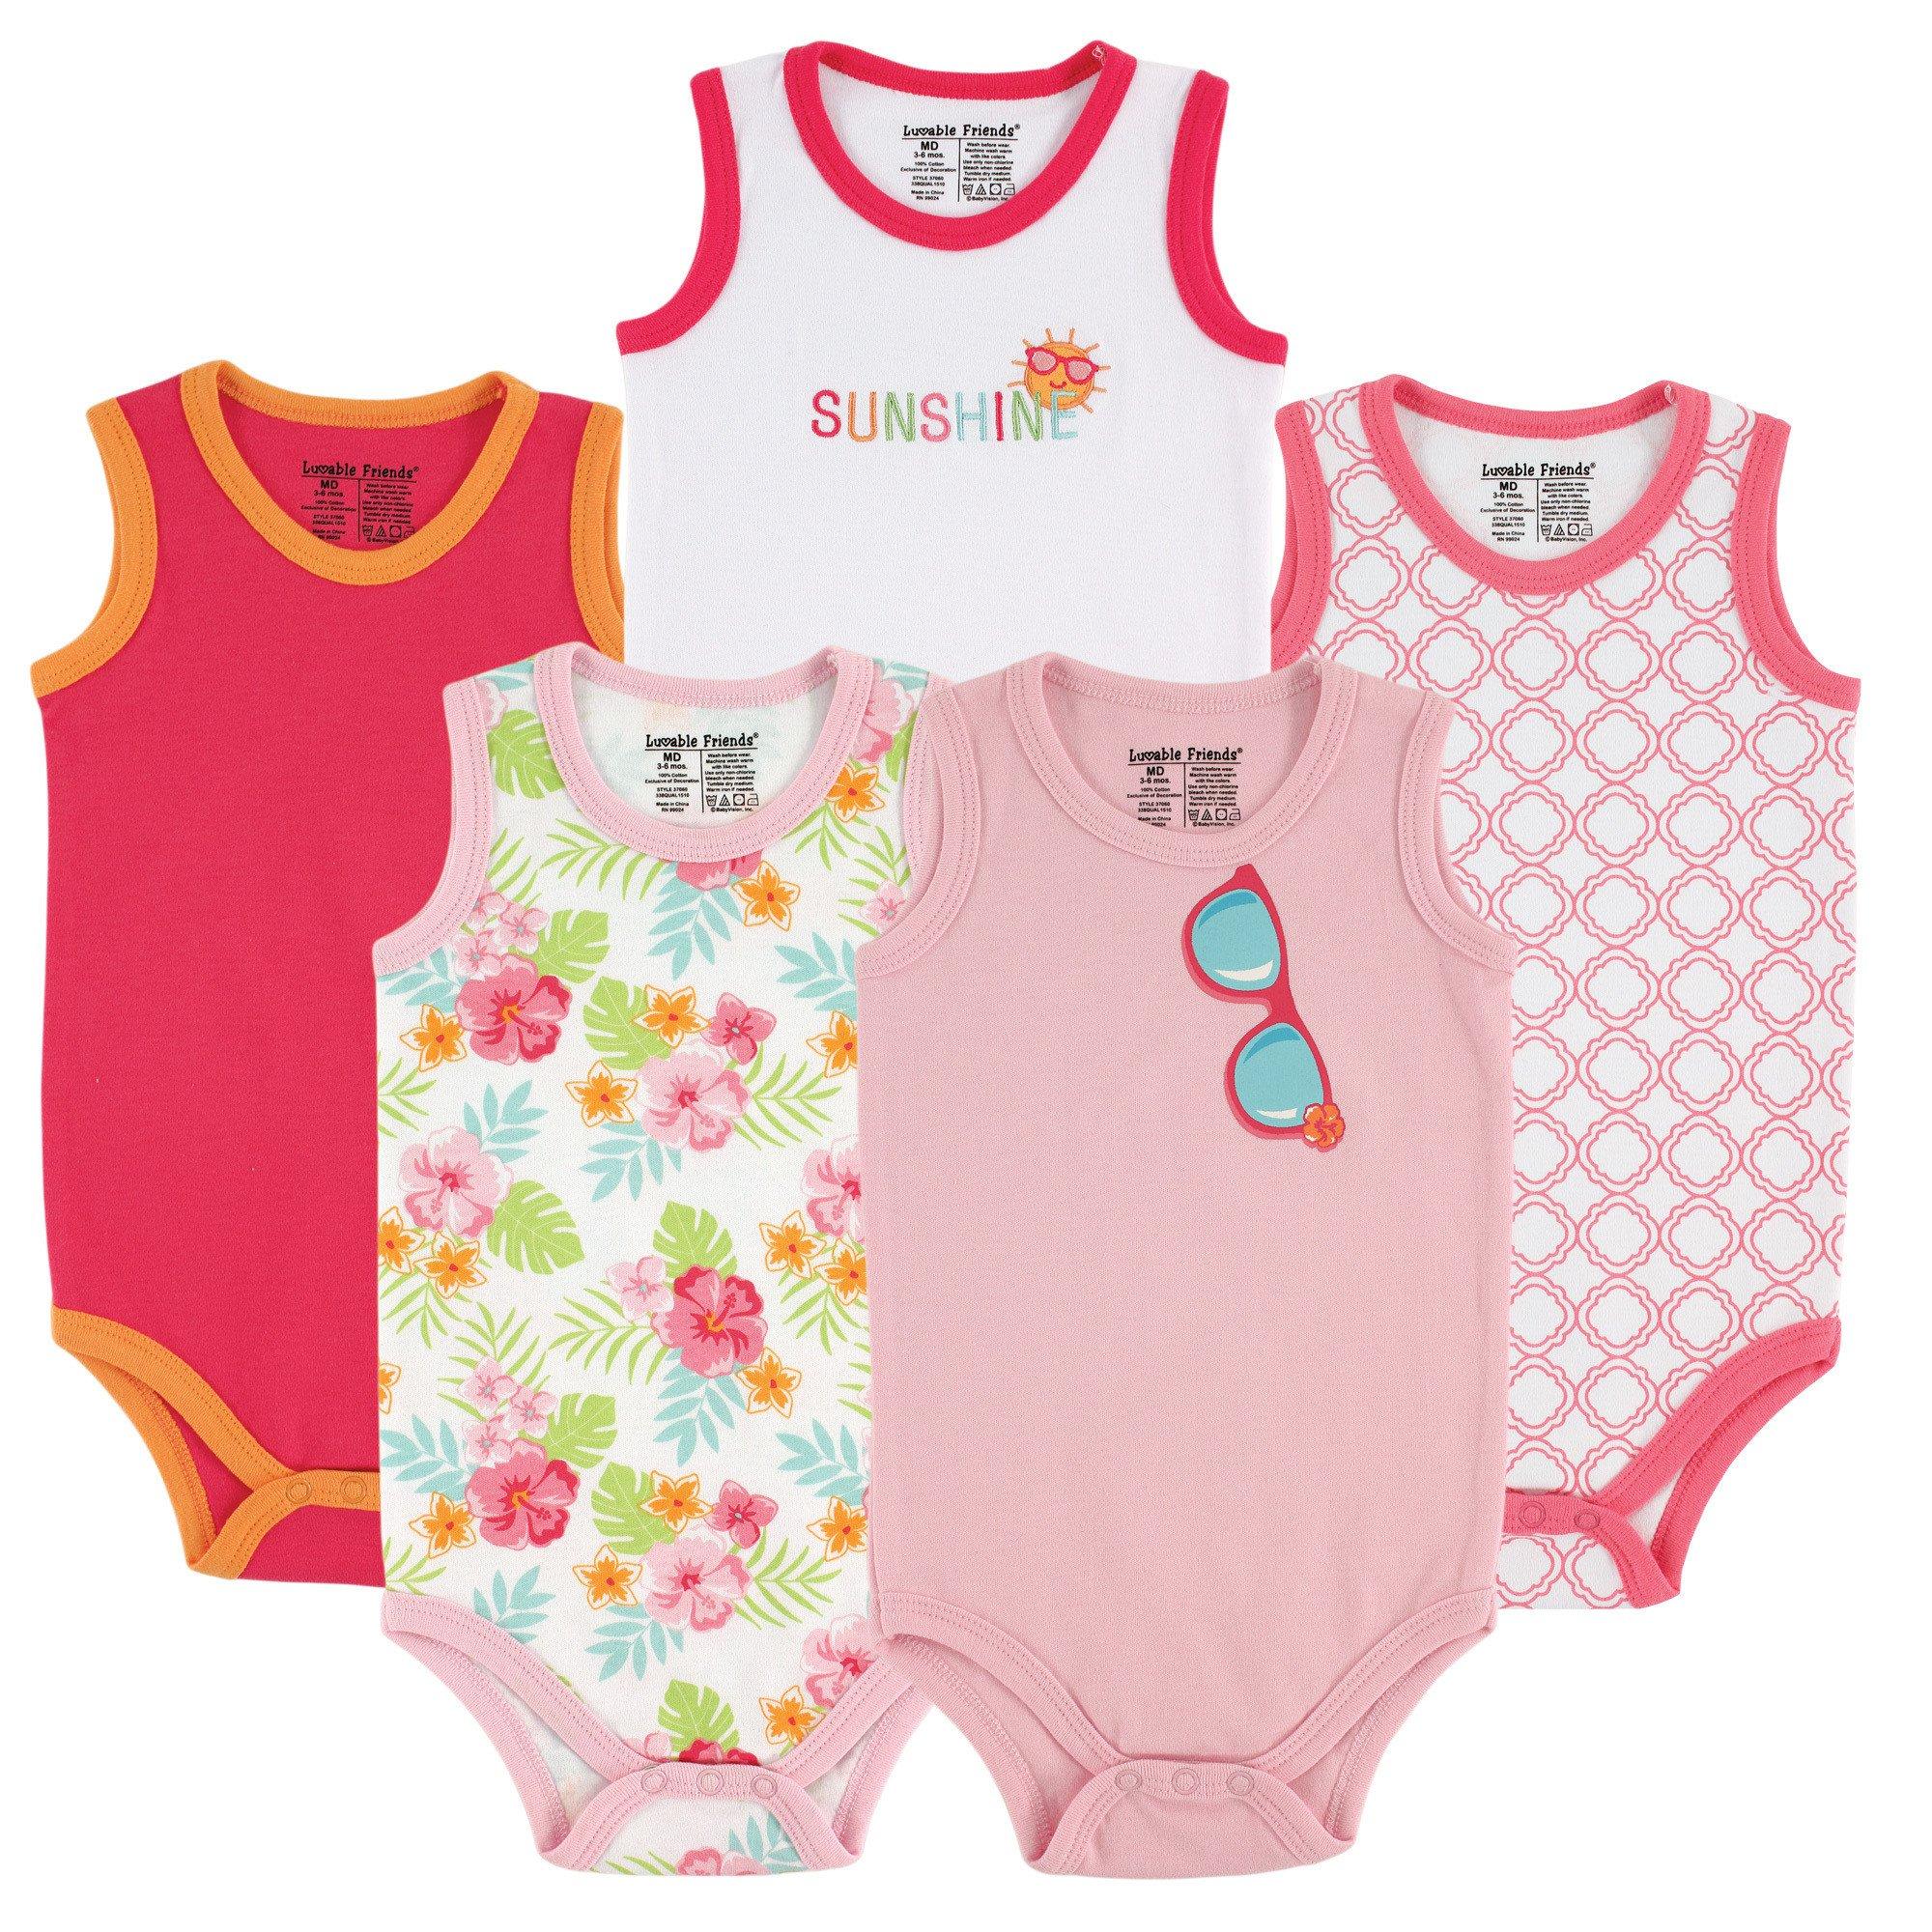 Luvable Friends Baby Infant 5-Pack Lightweight Sleeveless Bodysuits, Girl Sunglasses, 9-12 Months